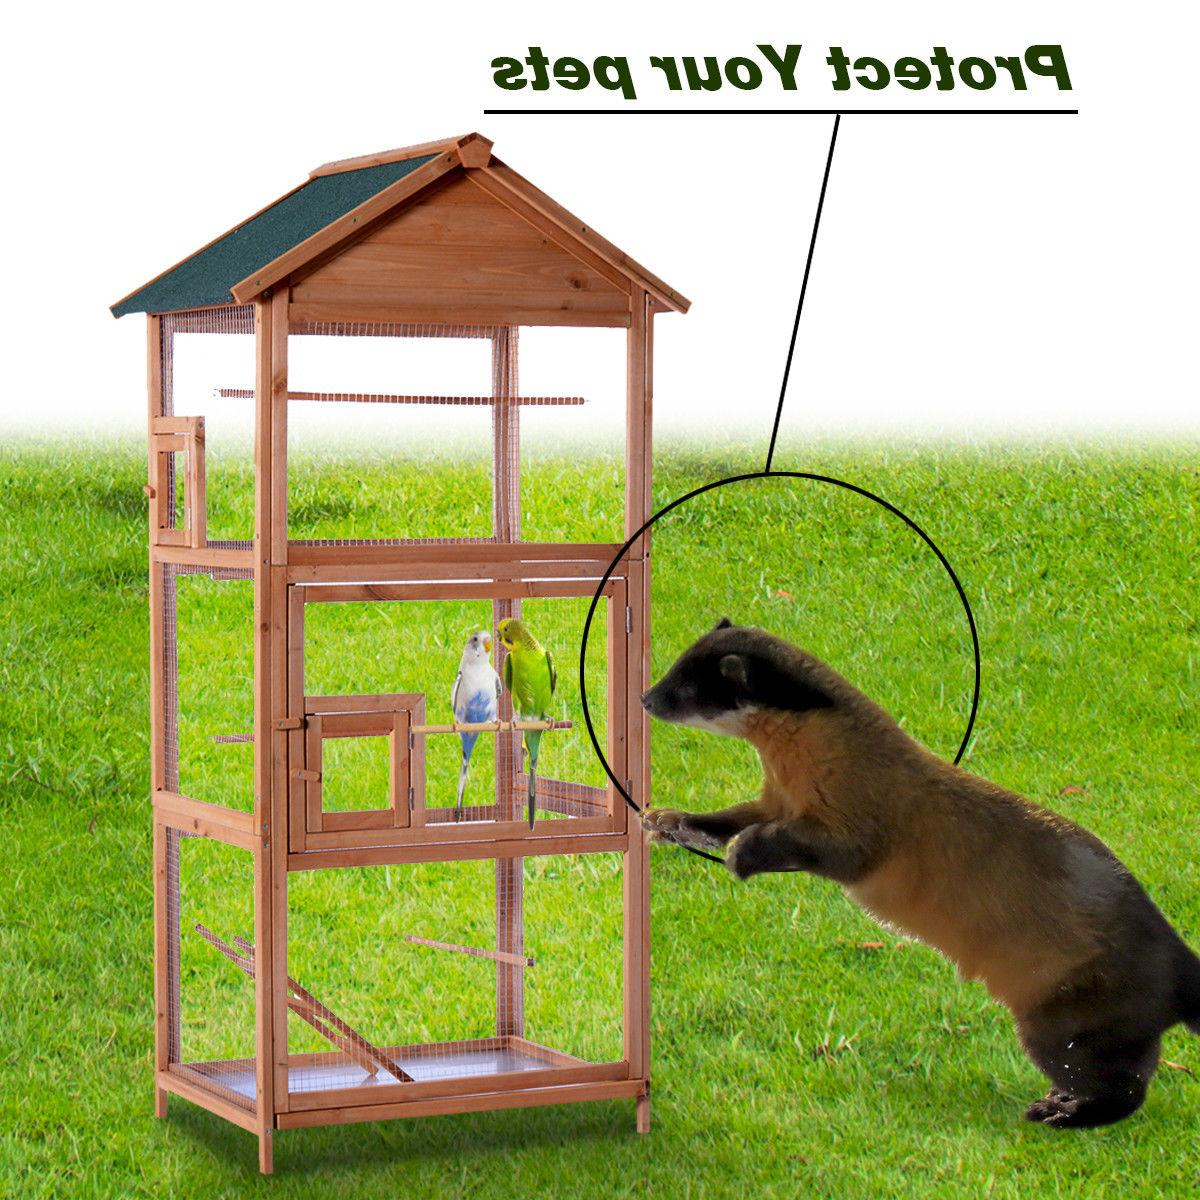 Wooden Cockatiel Parakeet Play House